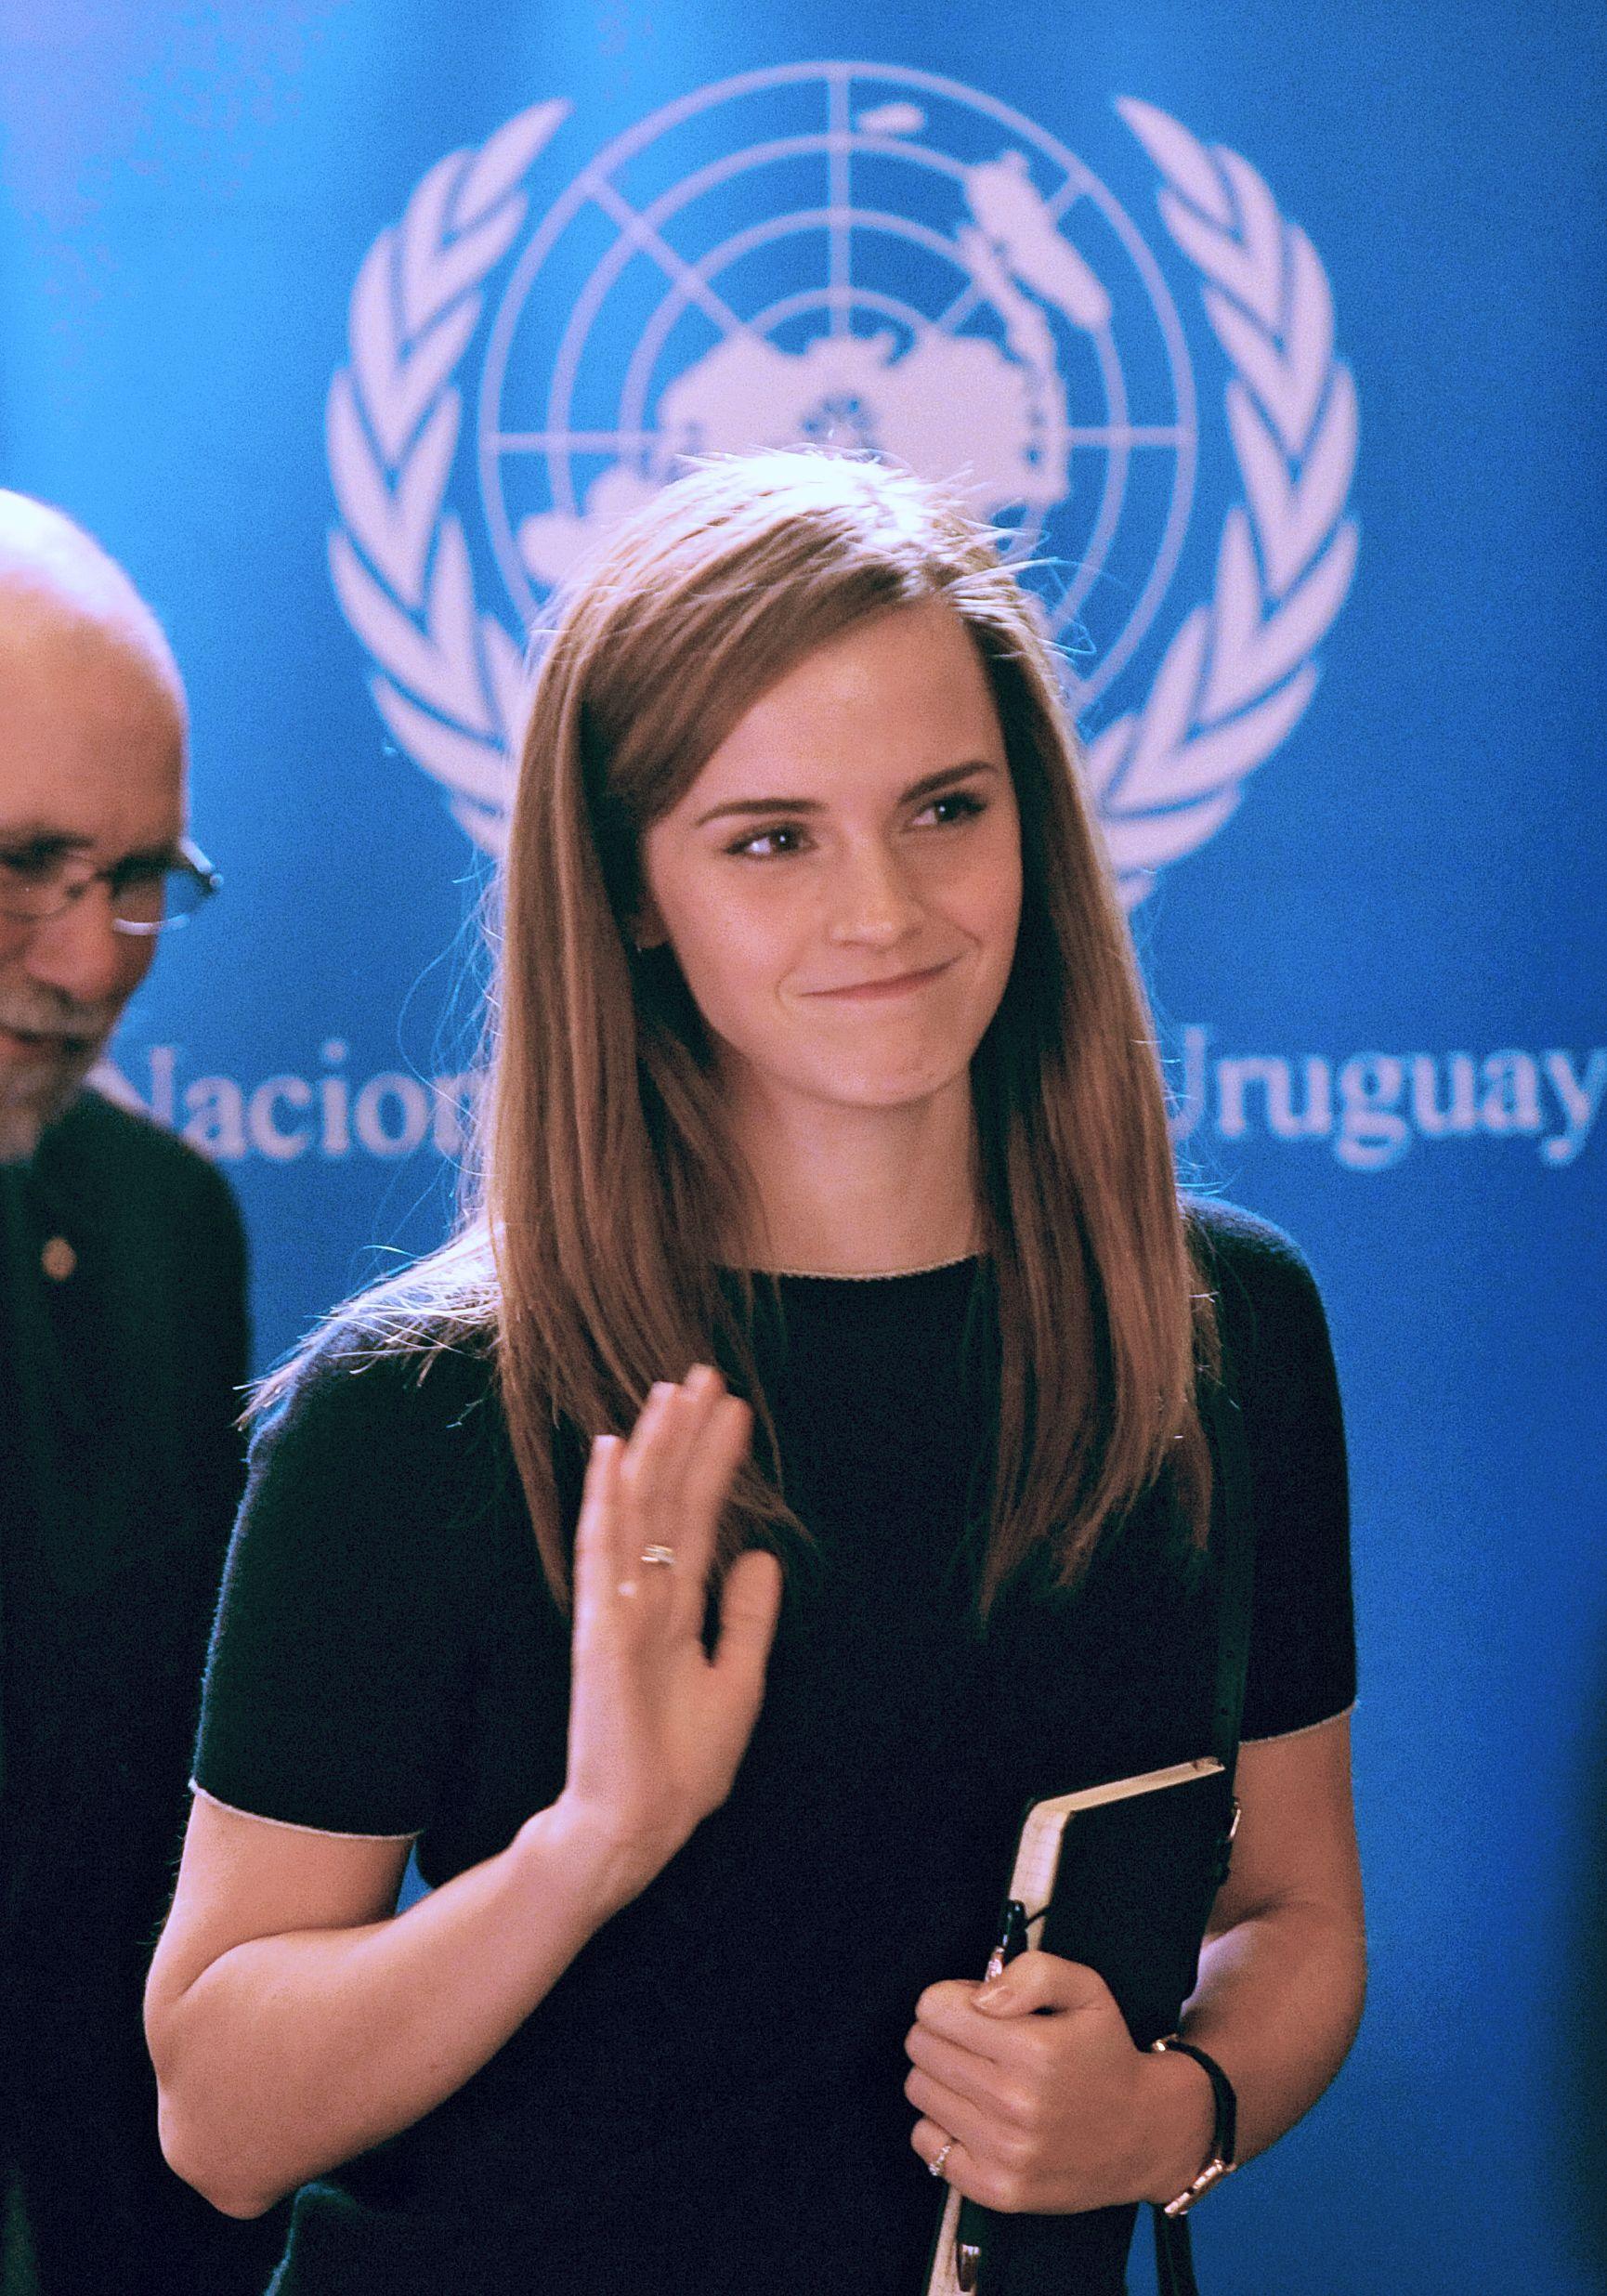 Emma Watson é a Embaixadora da Boa Vontade / MIGUEL ROJO/AFP